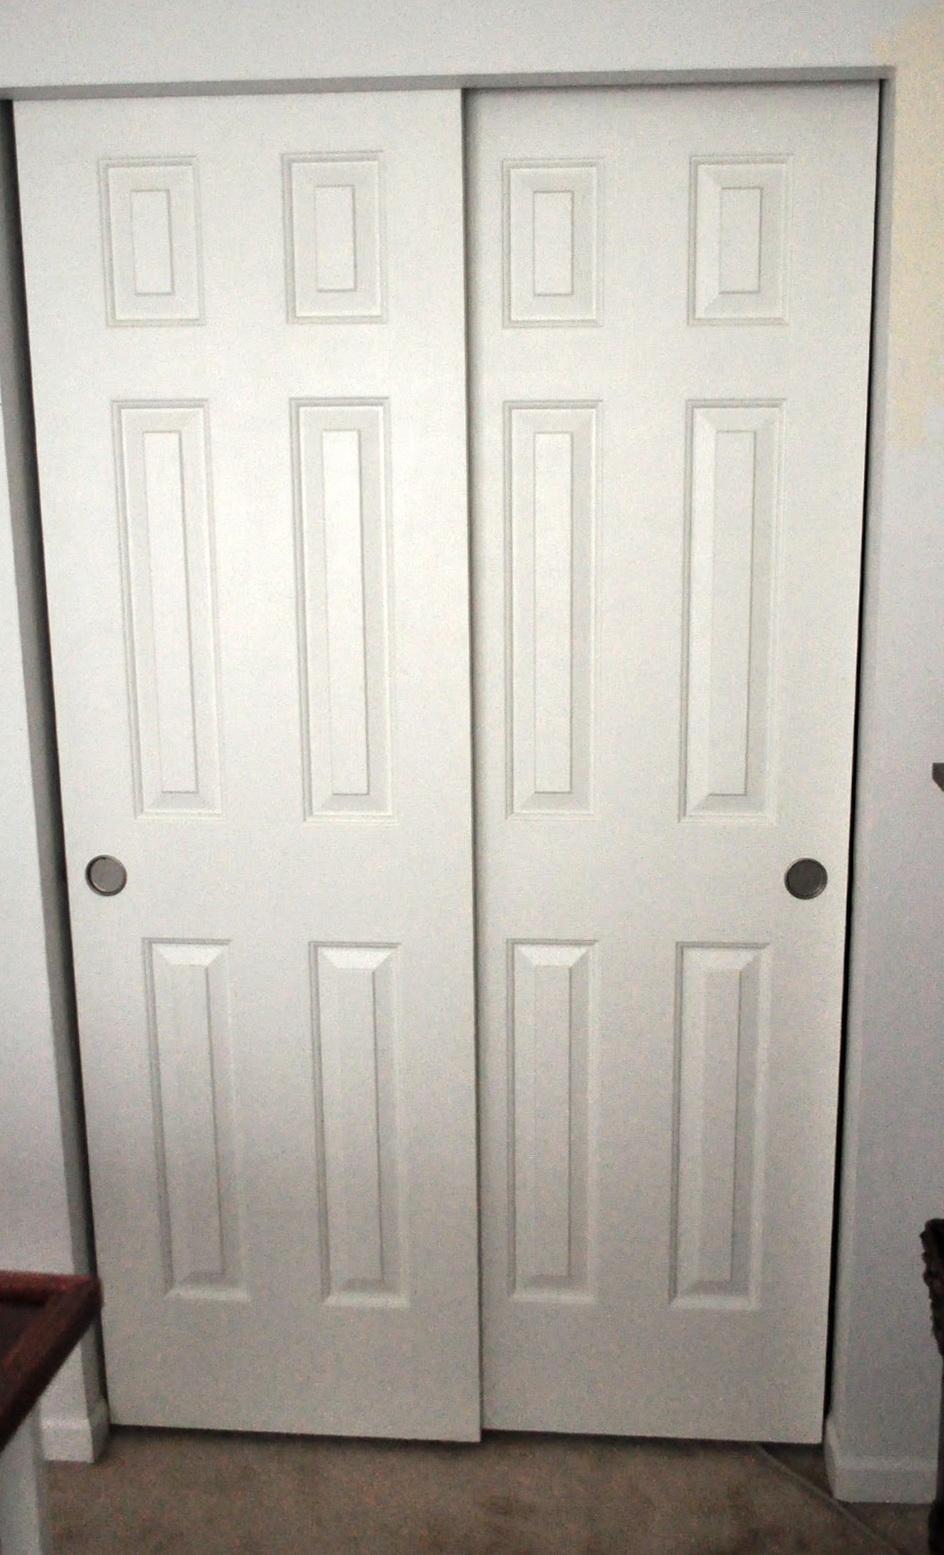 Types Of Sliding Closet Doors Home Design Ideas